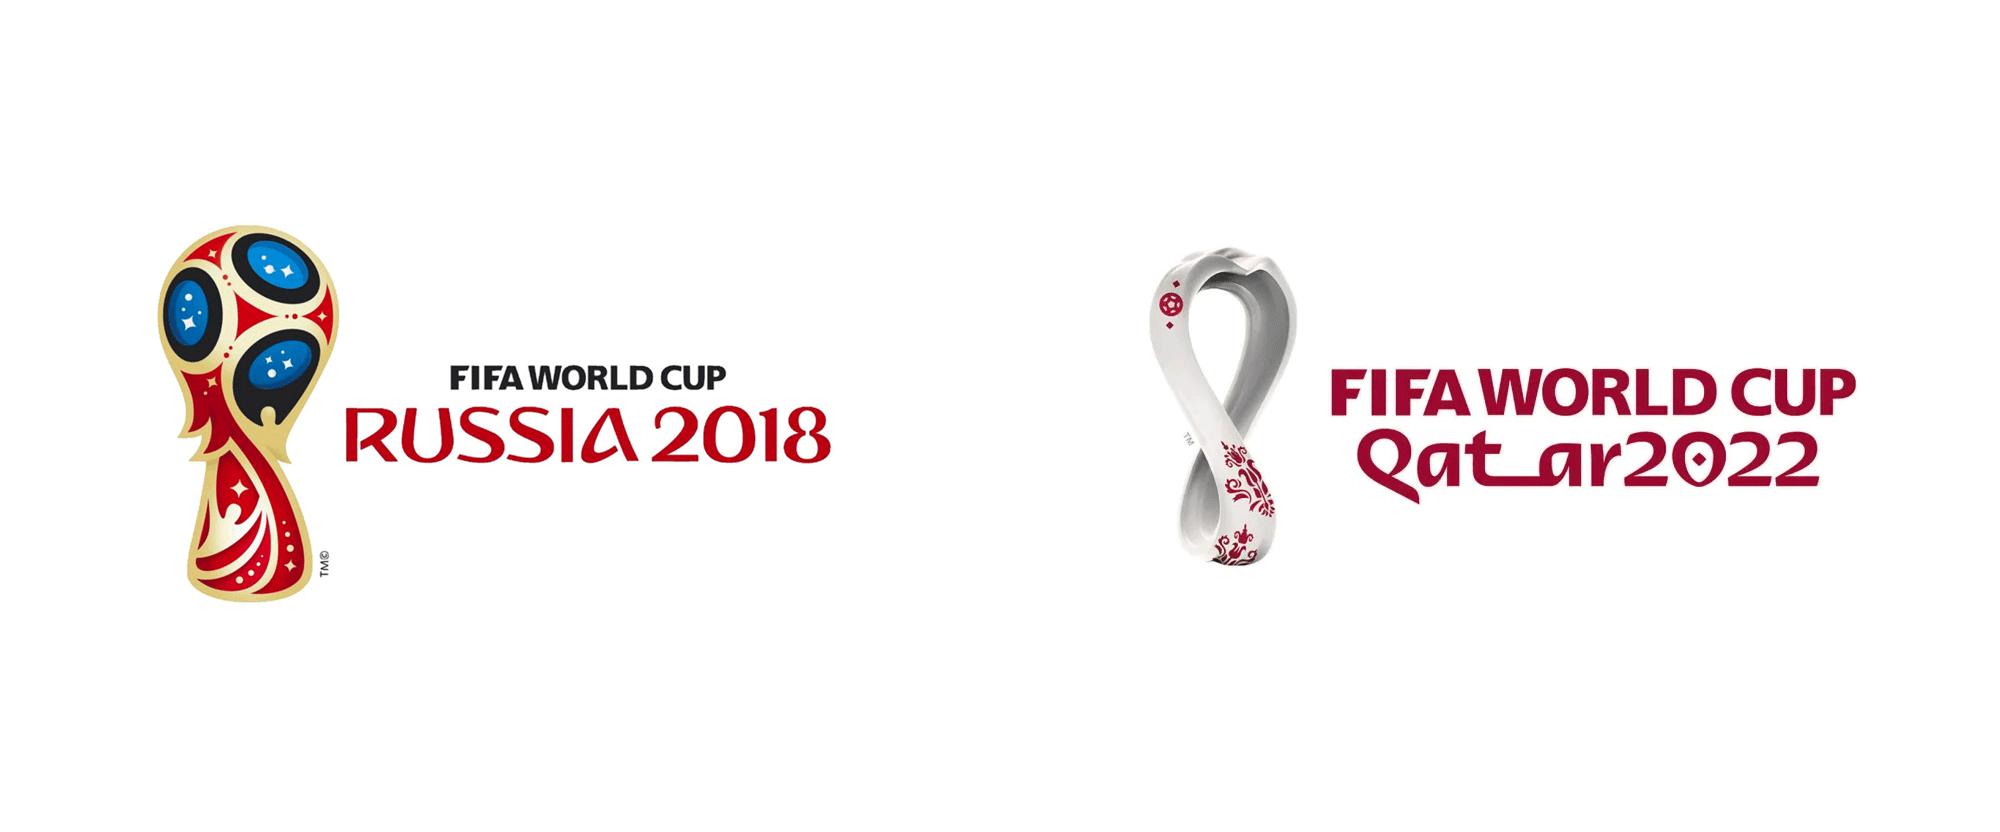 New Logo for Qatar 2022 FIFA World Cup by UnlockBrands